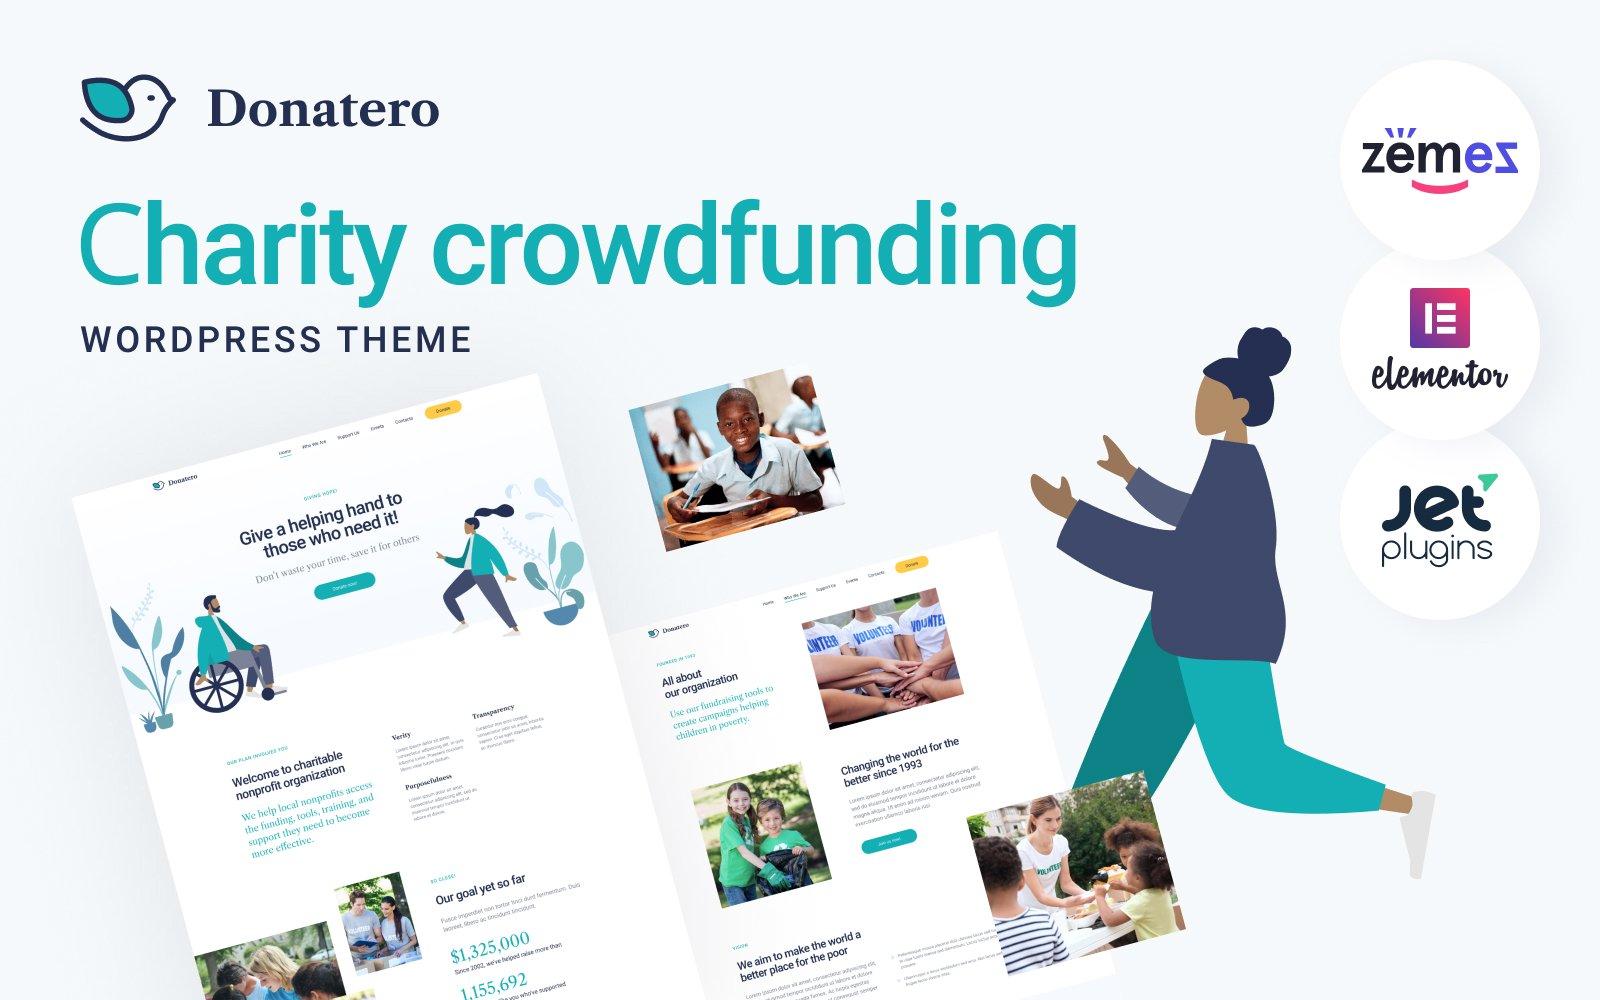 Donatero - Charity Crowdfunding WordPress Theme